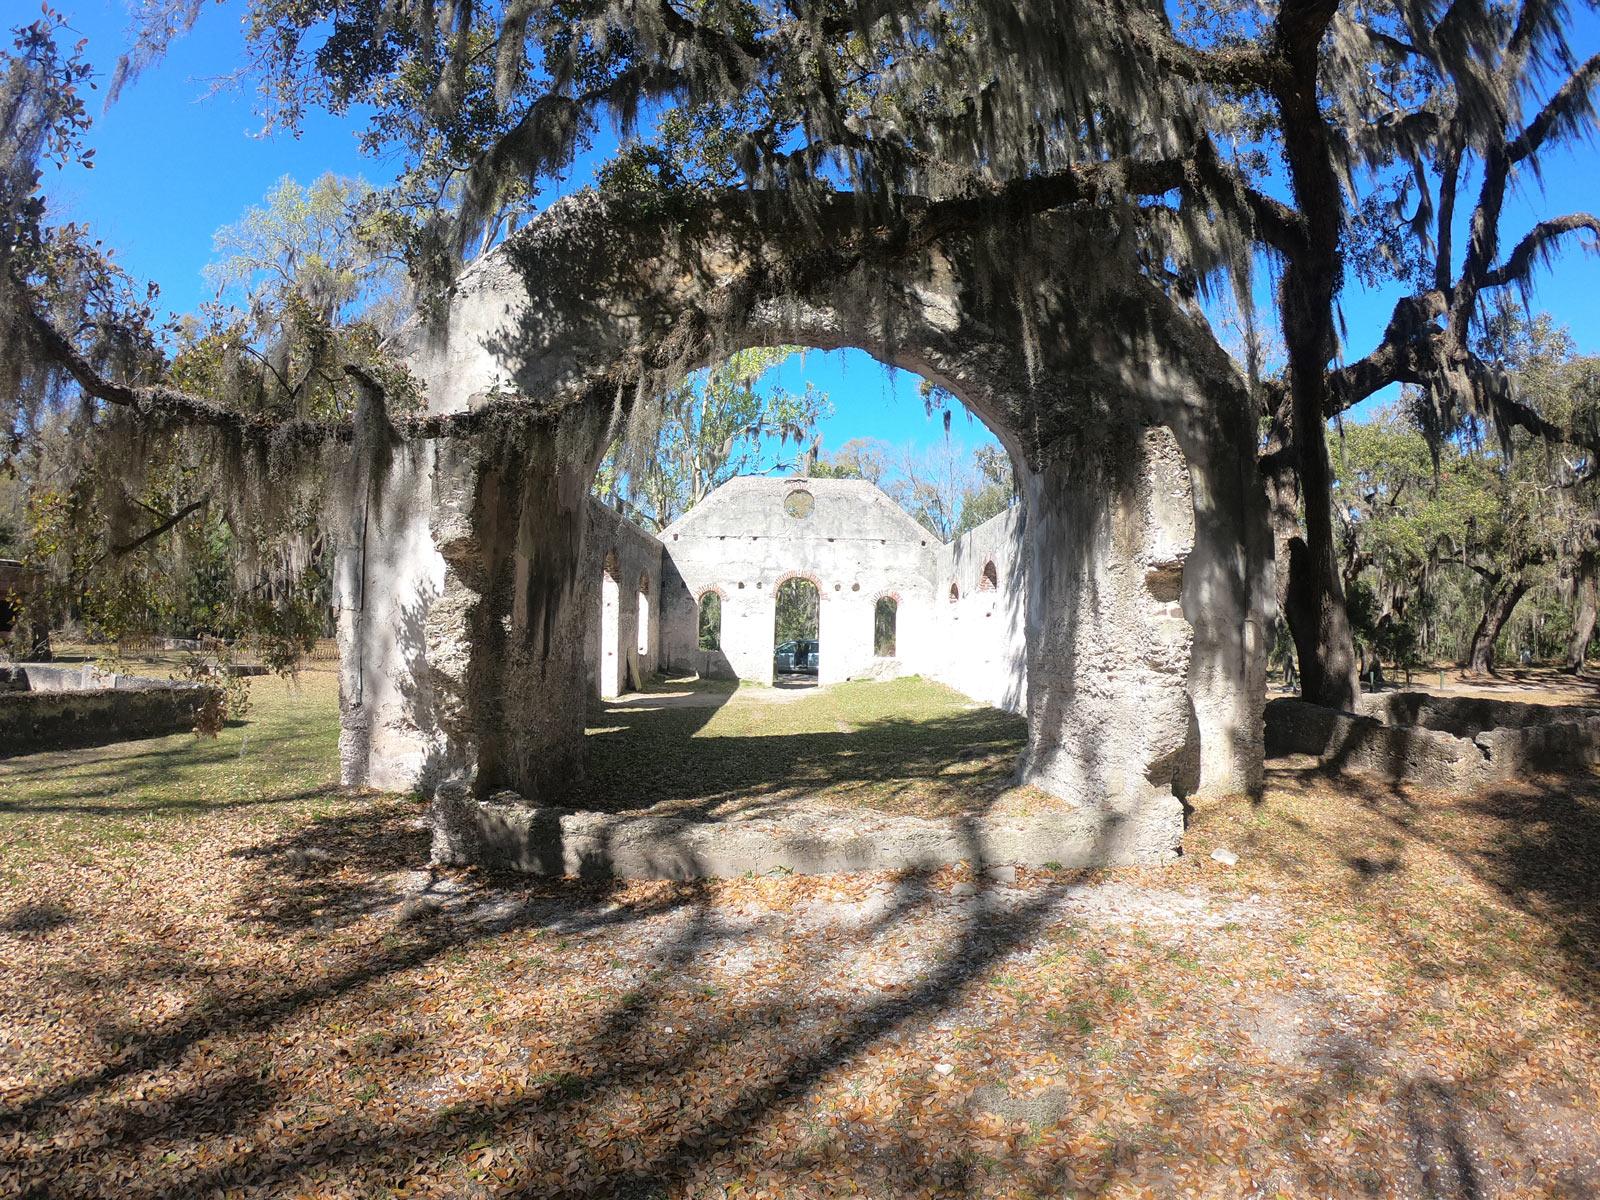 Chape of Ease ruins surrounded by blue sky, live oaks, Spanish moss near Beaufort, South Carolina